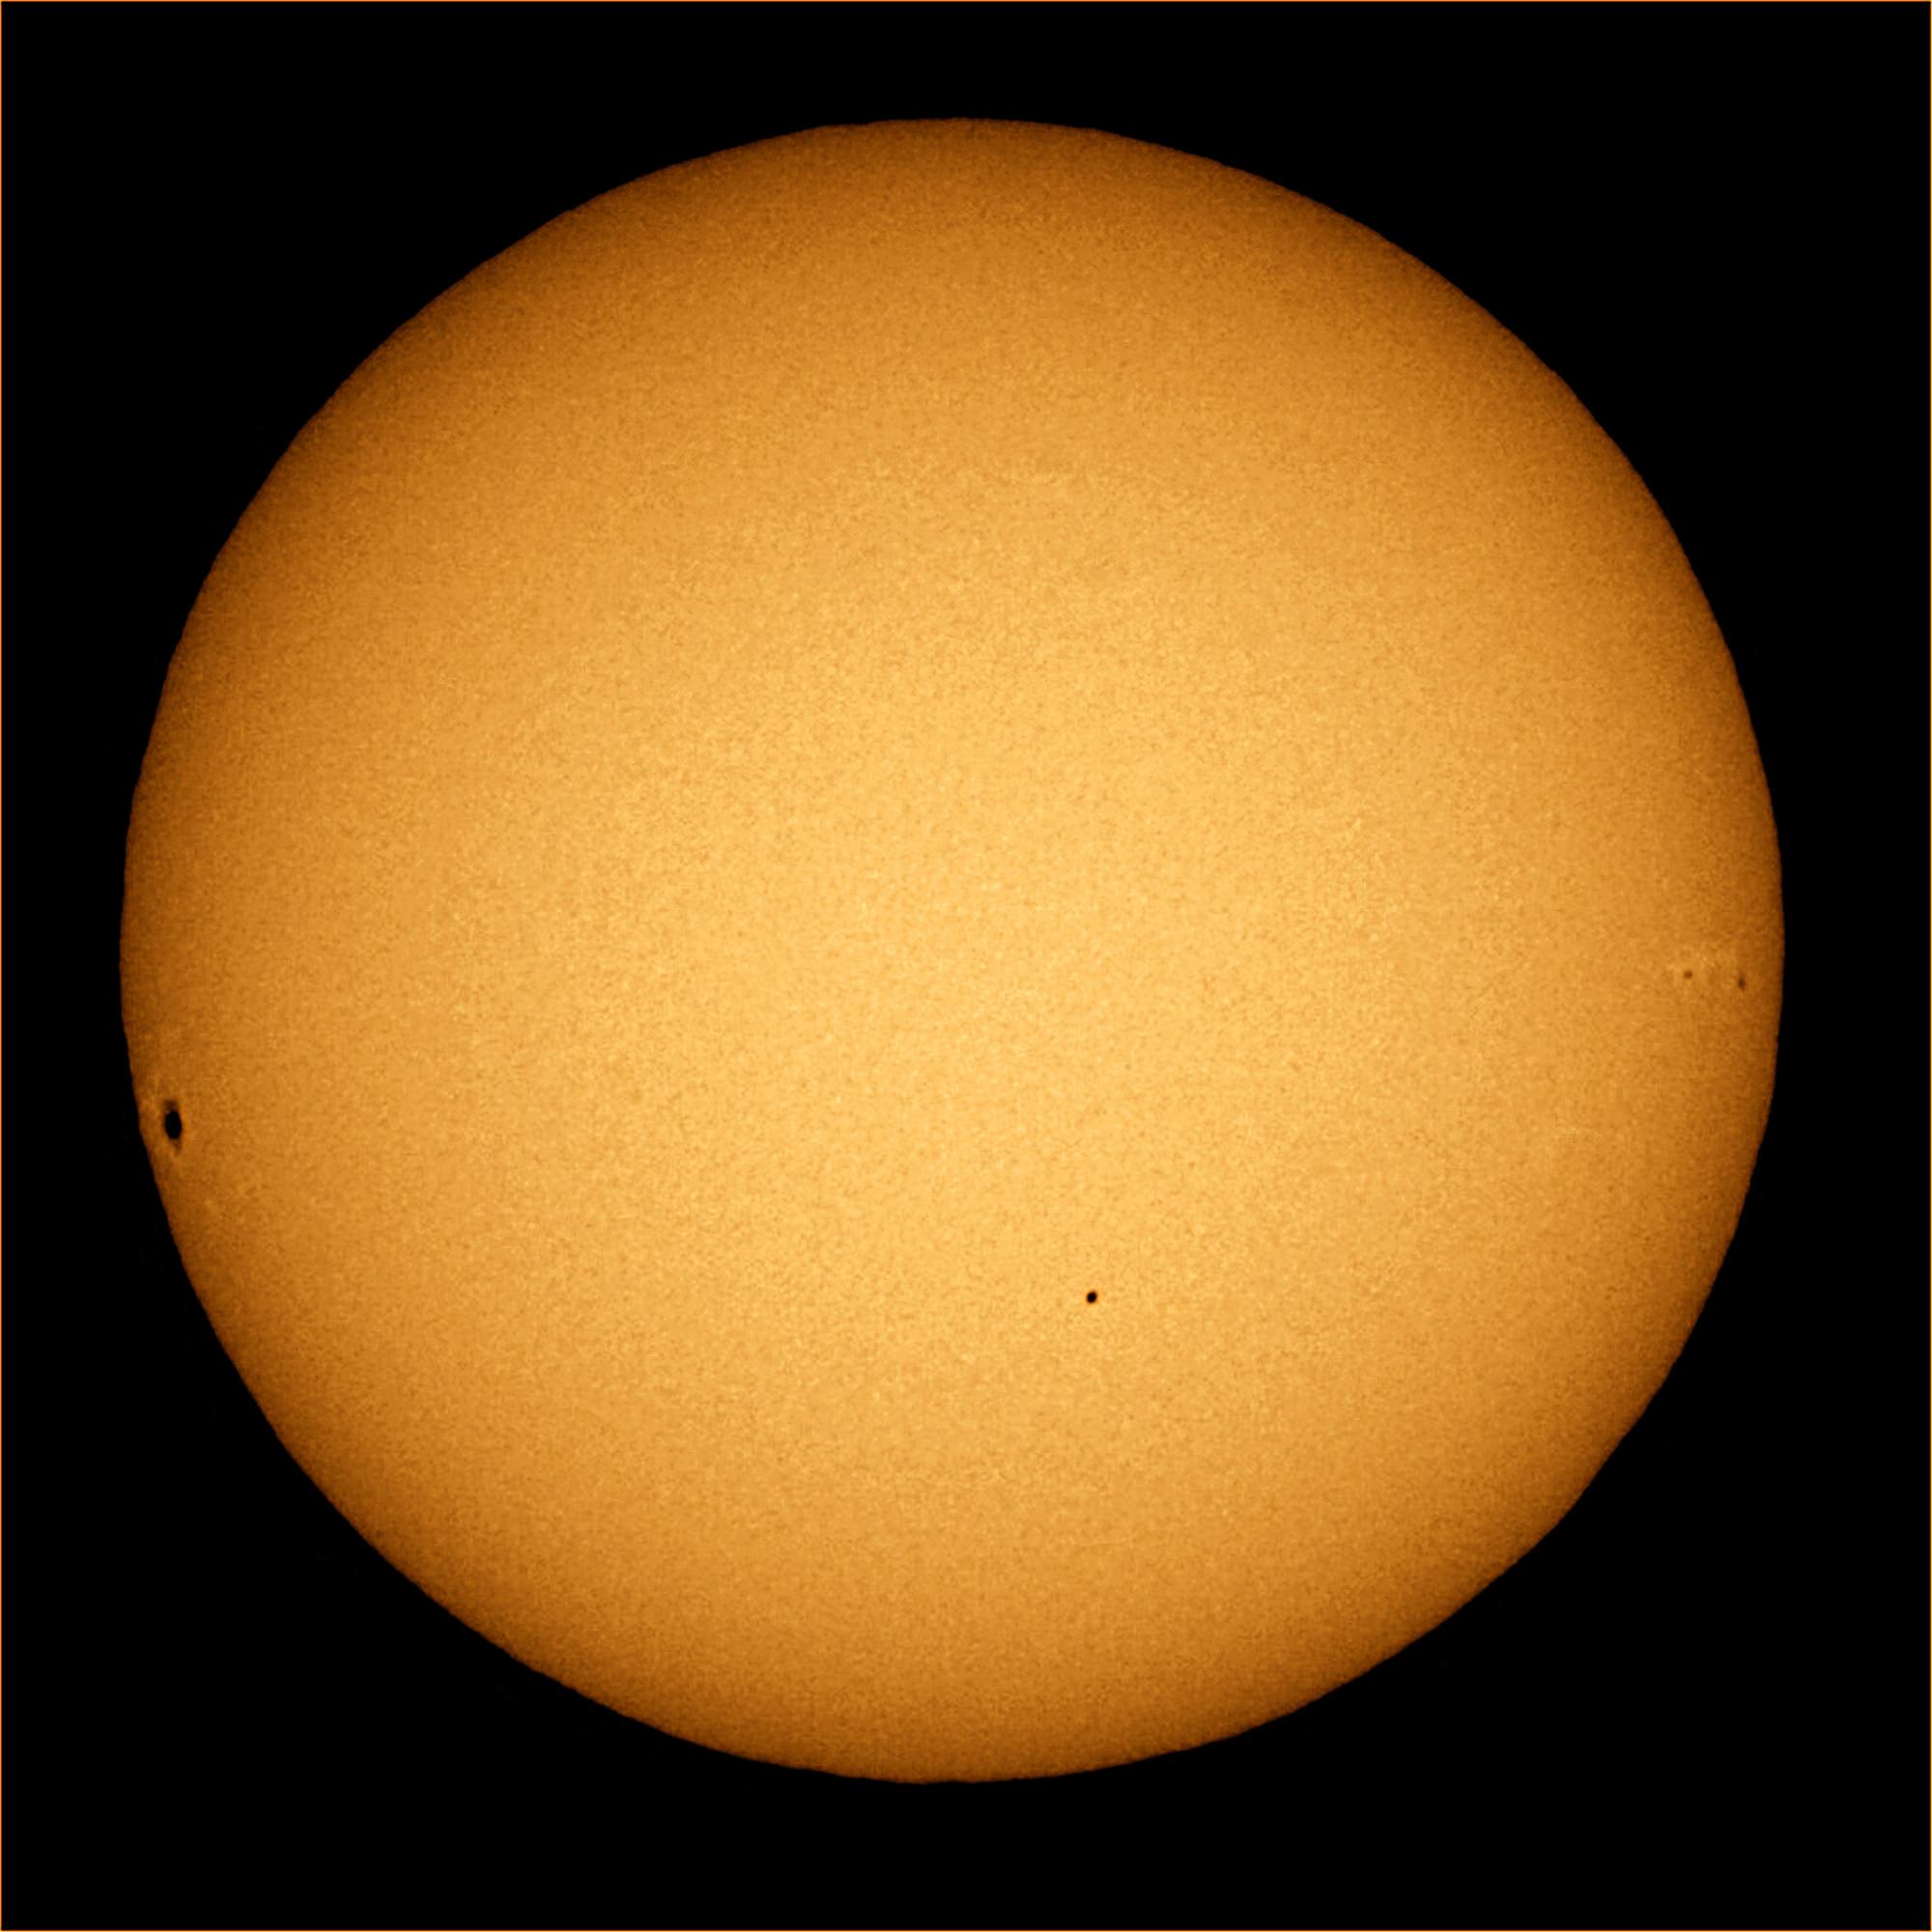 November 2006 Transit of Mercury